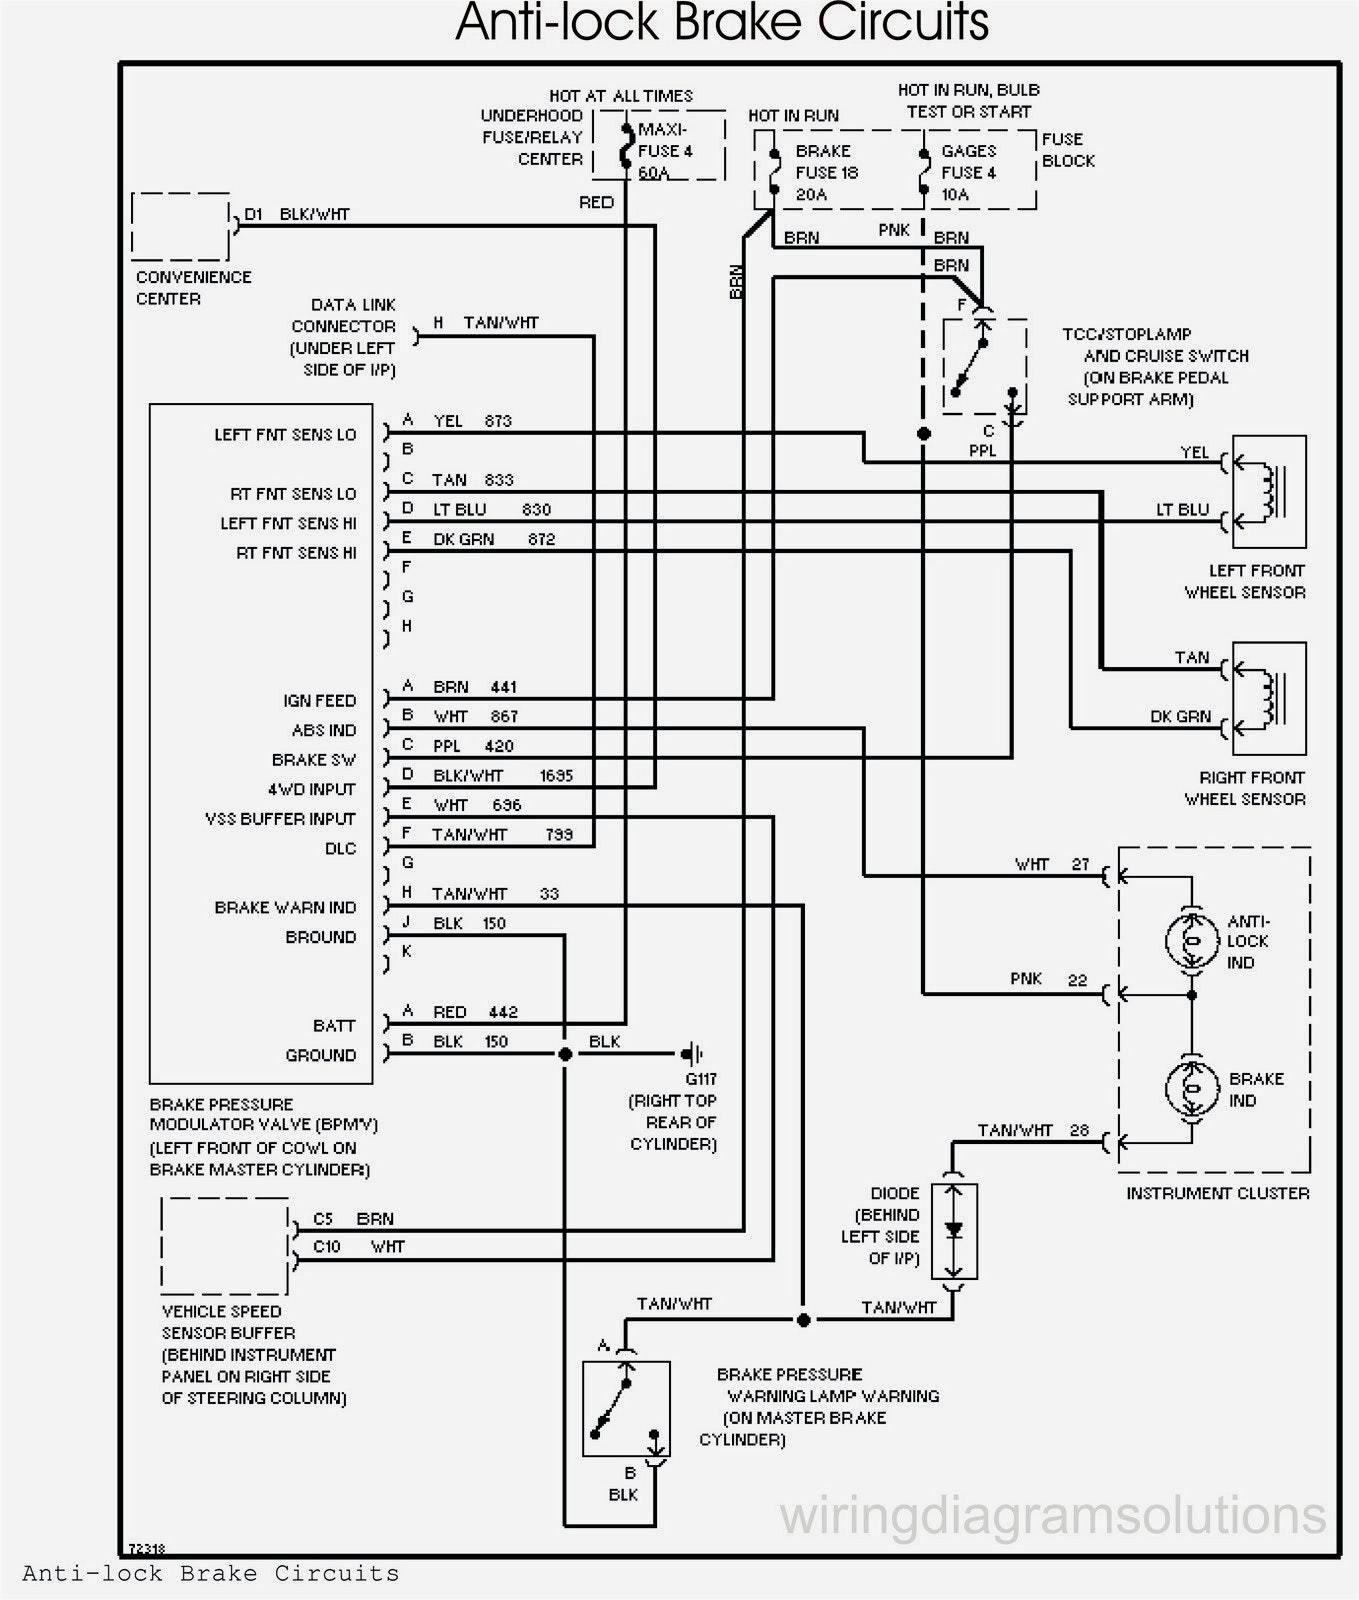 Voyager Backup Camera Wiring Diagram   Best Wiring Library - Voyager Backup Camera Wiring Diagram